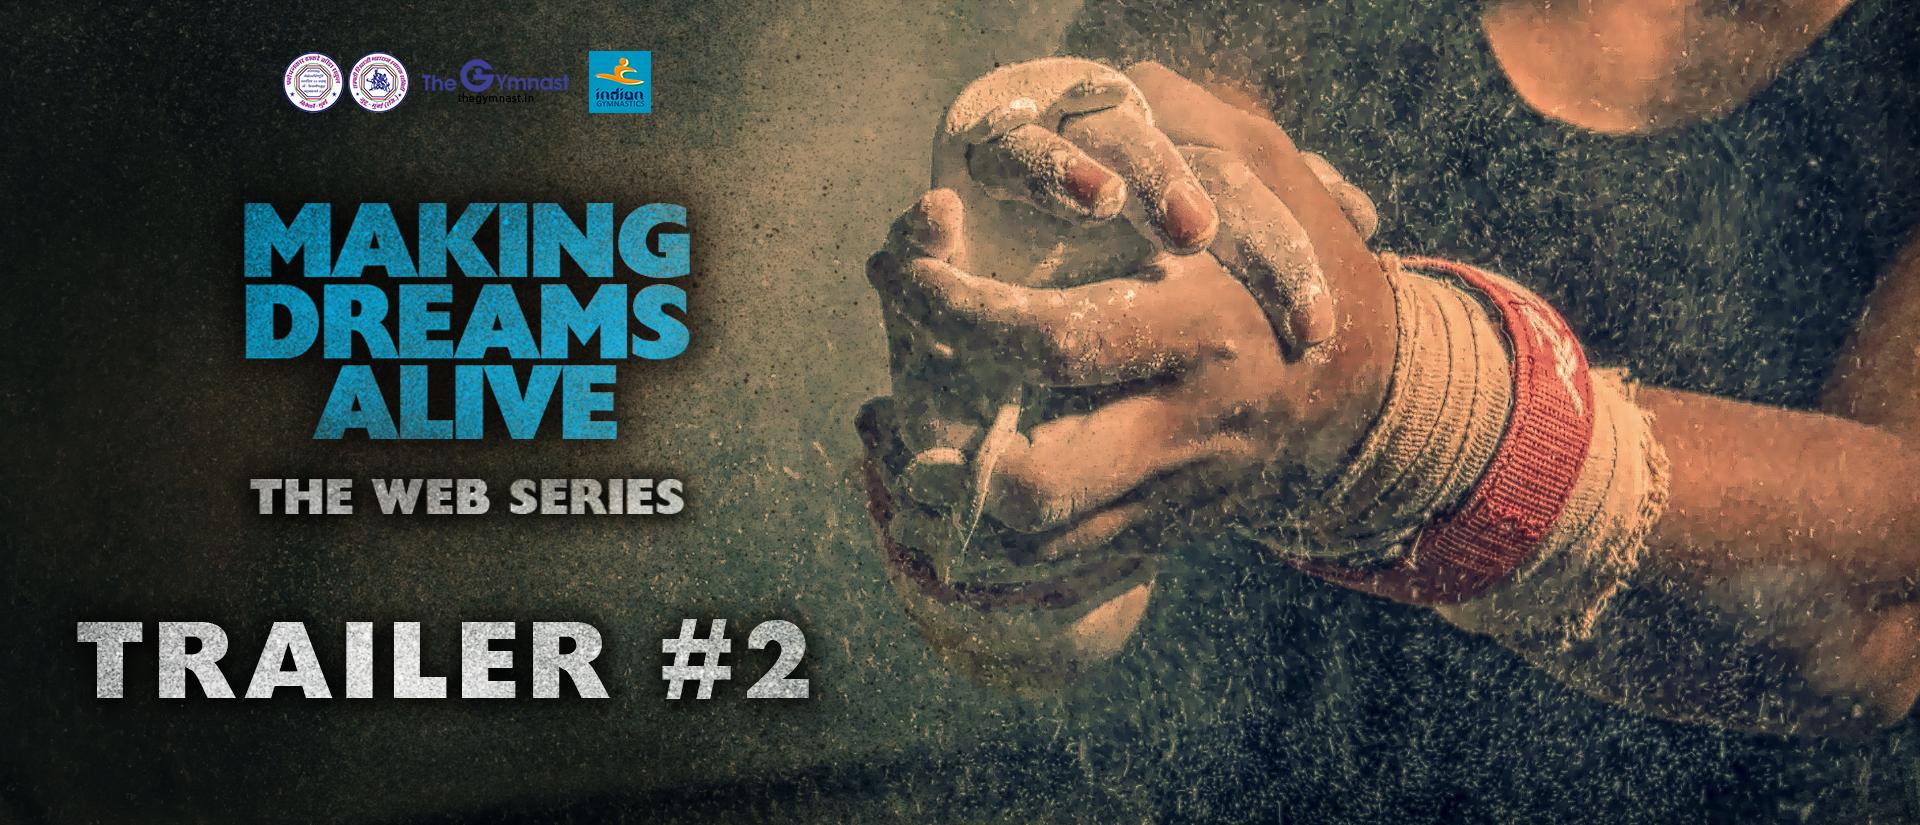 Making Dreams Alive | Trailer #2